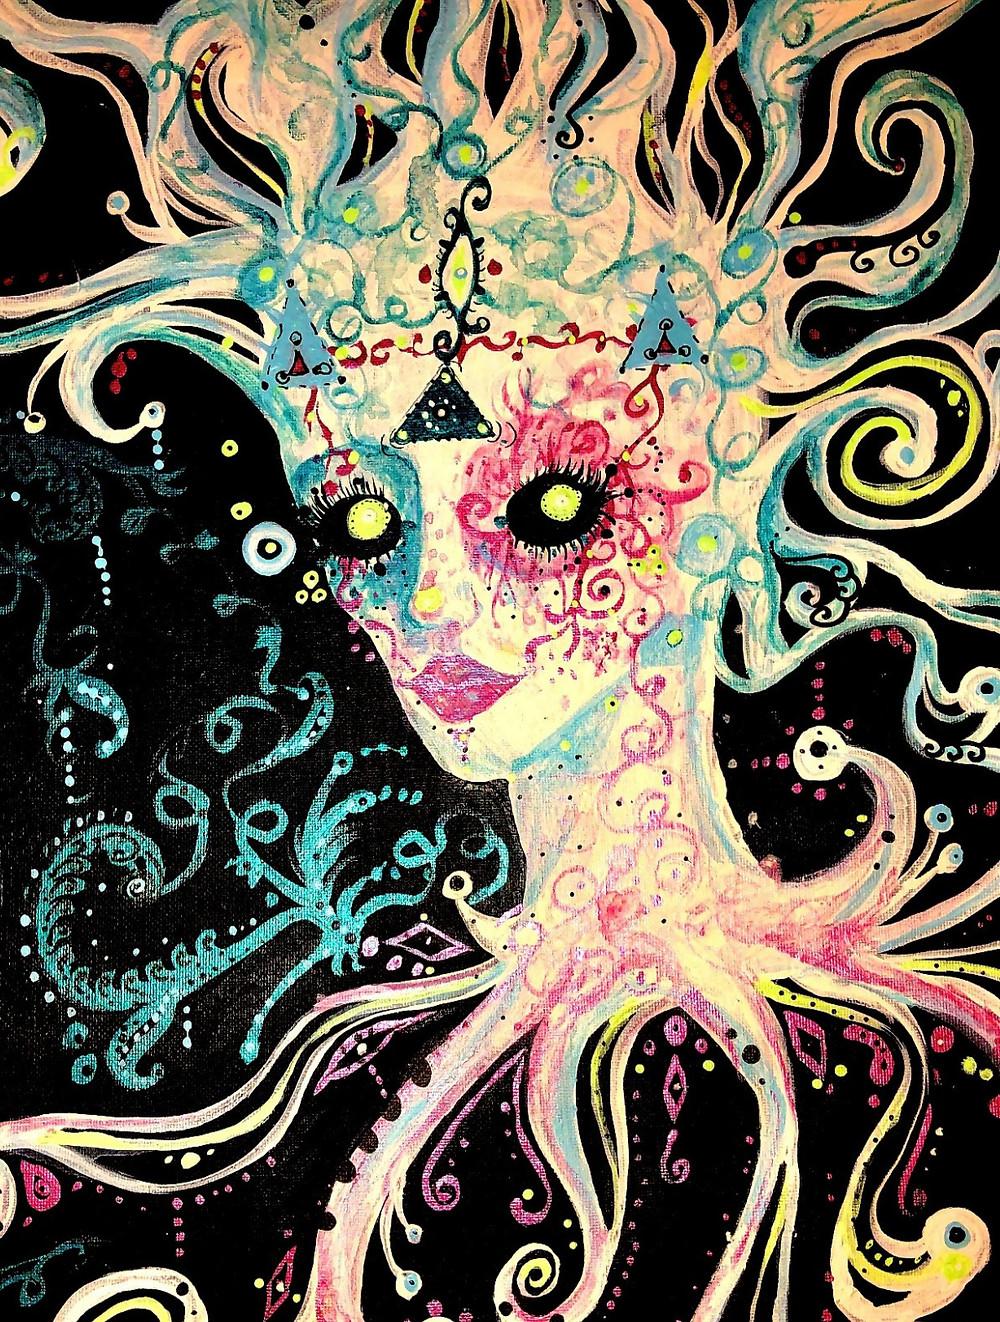 Graphic portrait of Medusa in vibrant colors.